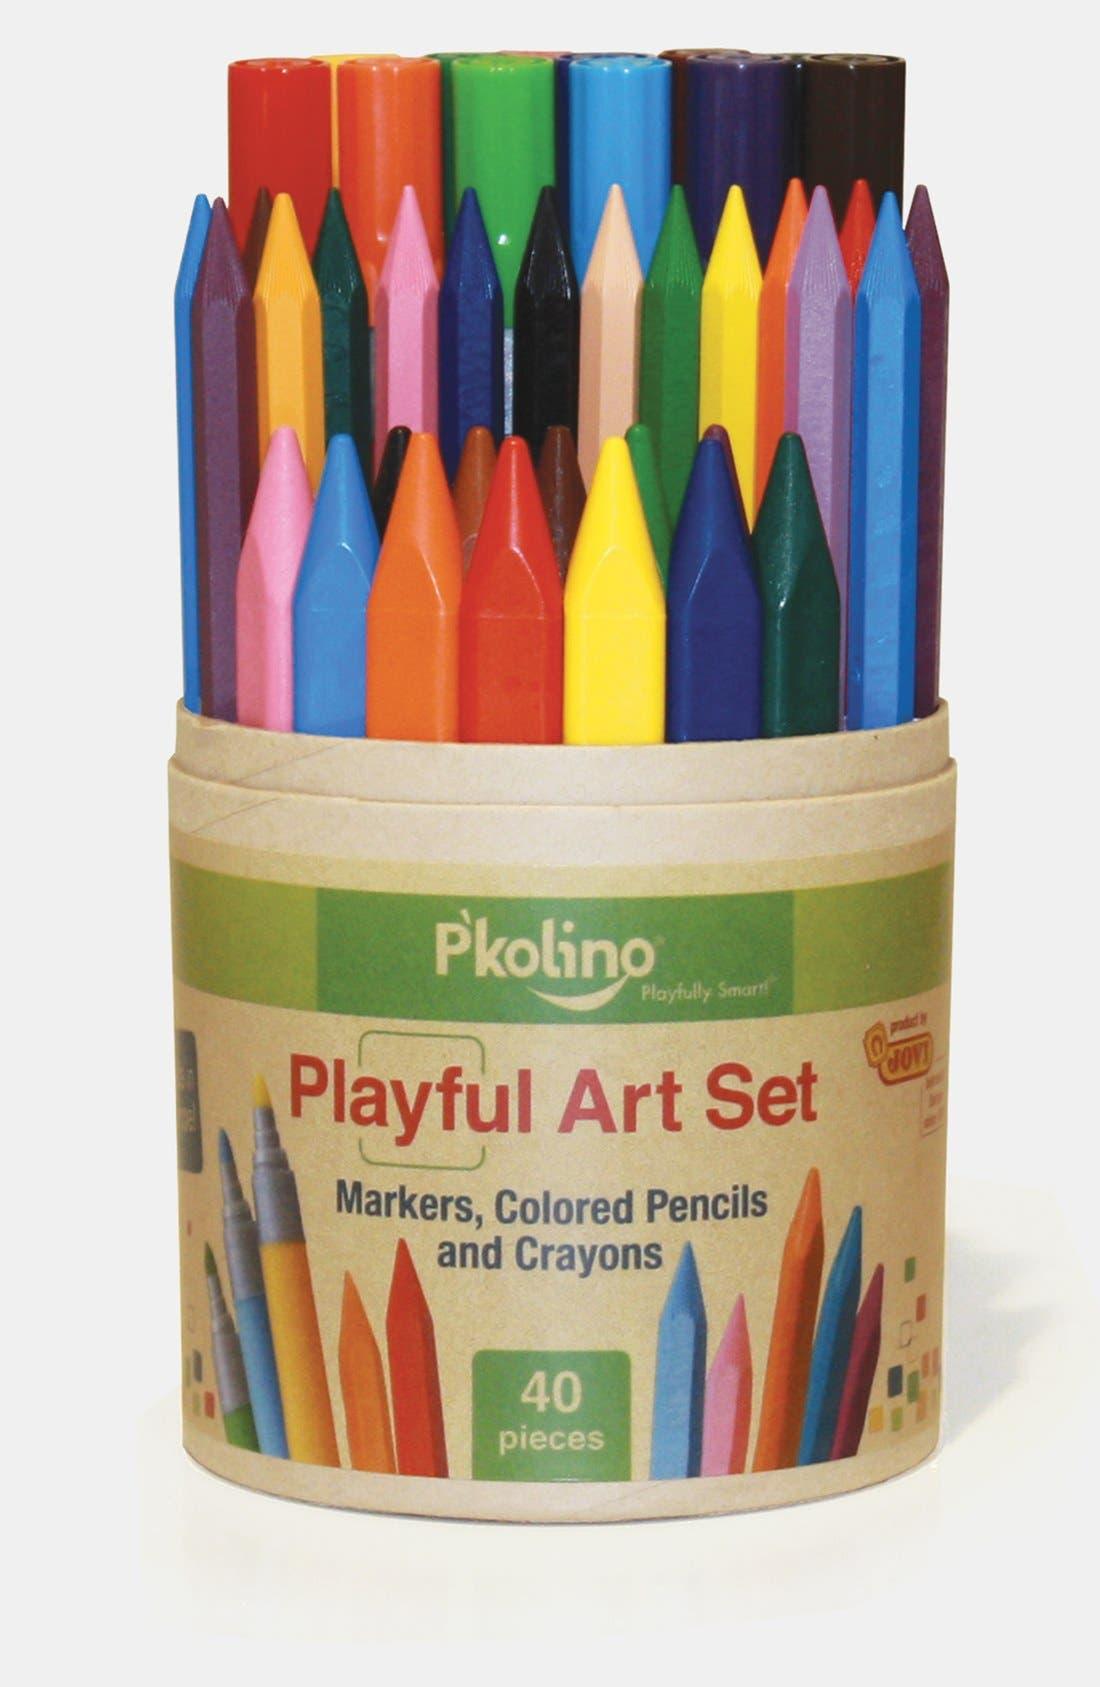 Alternate Image 1 Selected - P'kolino Playful Art Set